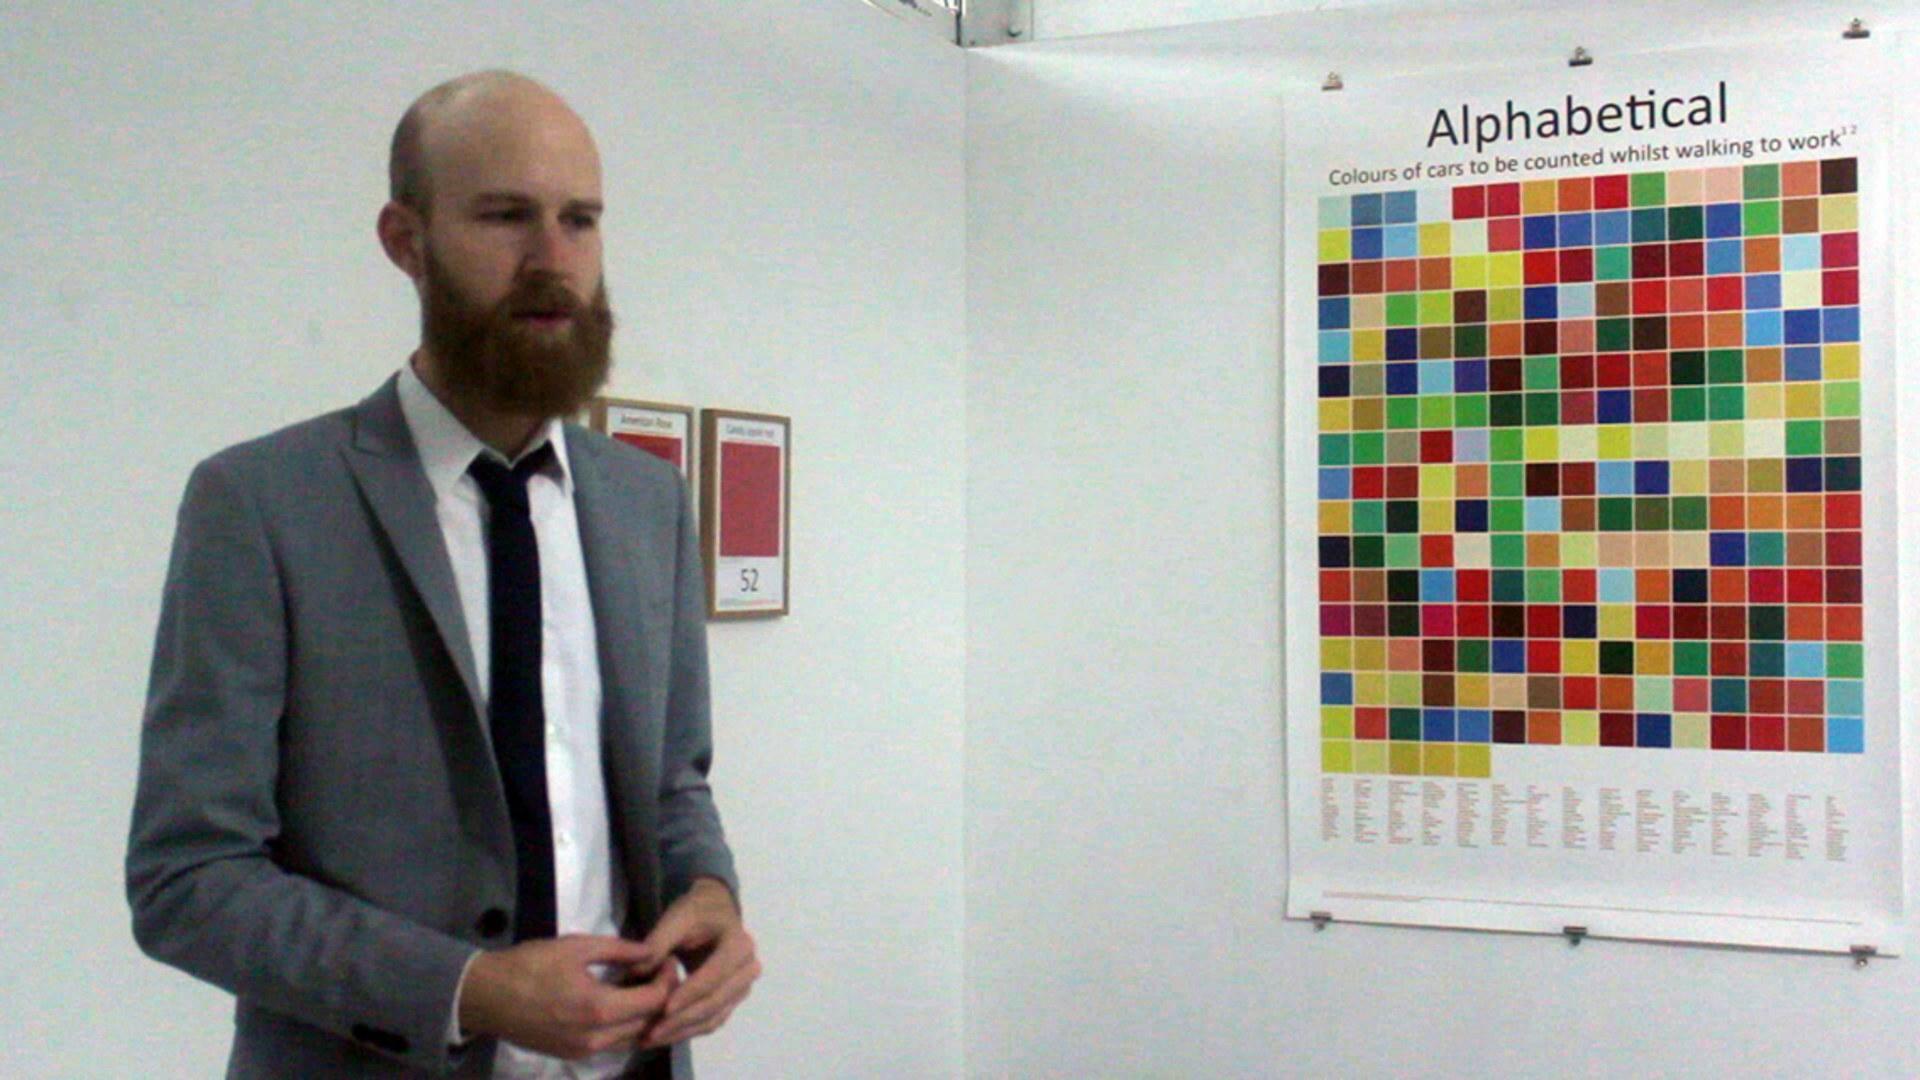 Kees van Lankveld; In Presentation Alphabetical Order